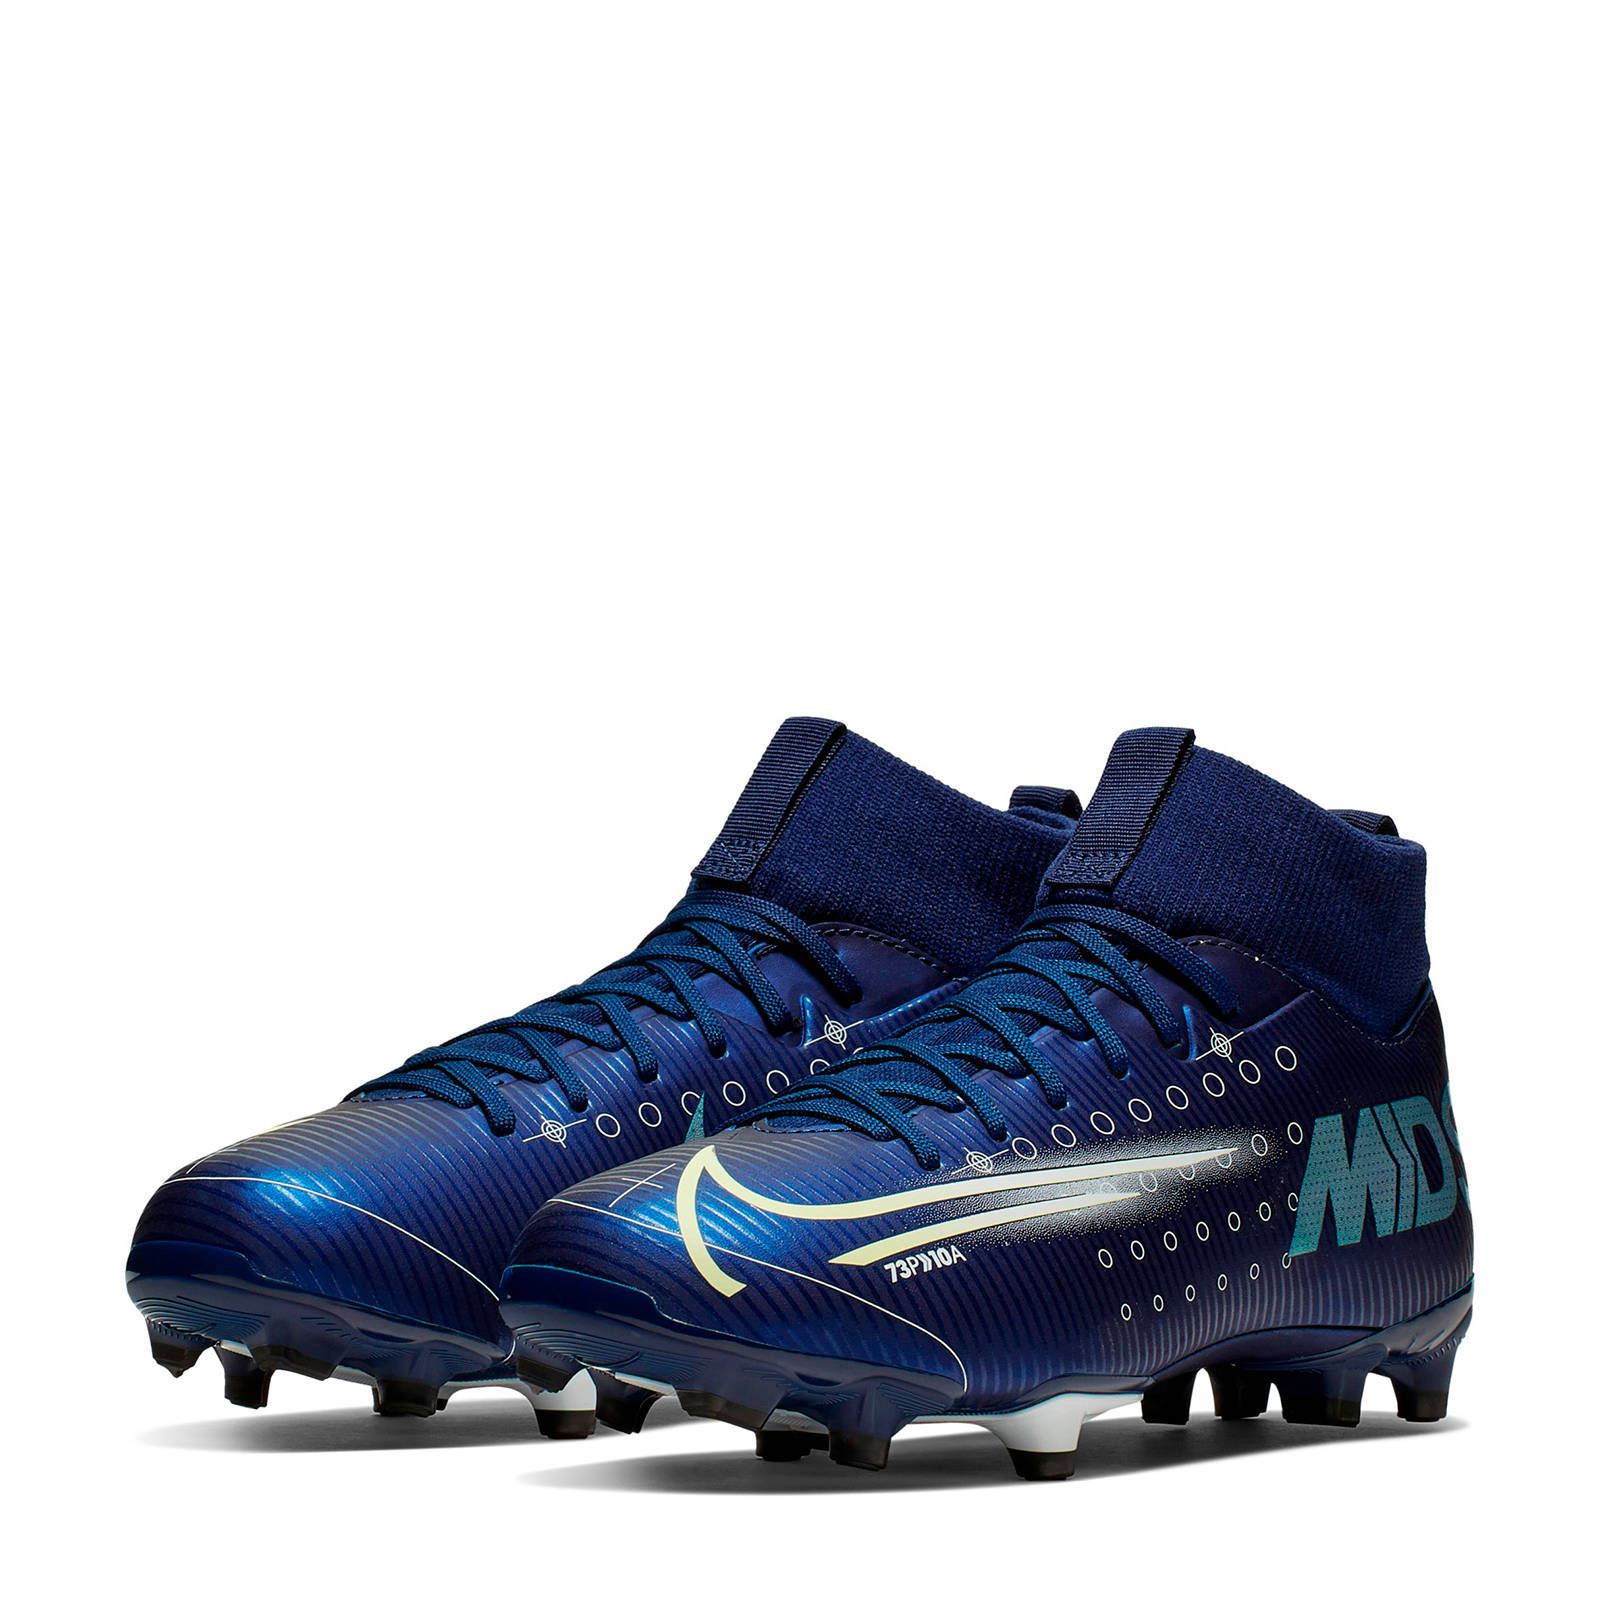 Nike Mercurial Superfly 7 Academy FGMG Jr. voetbalschoenen